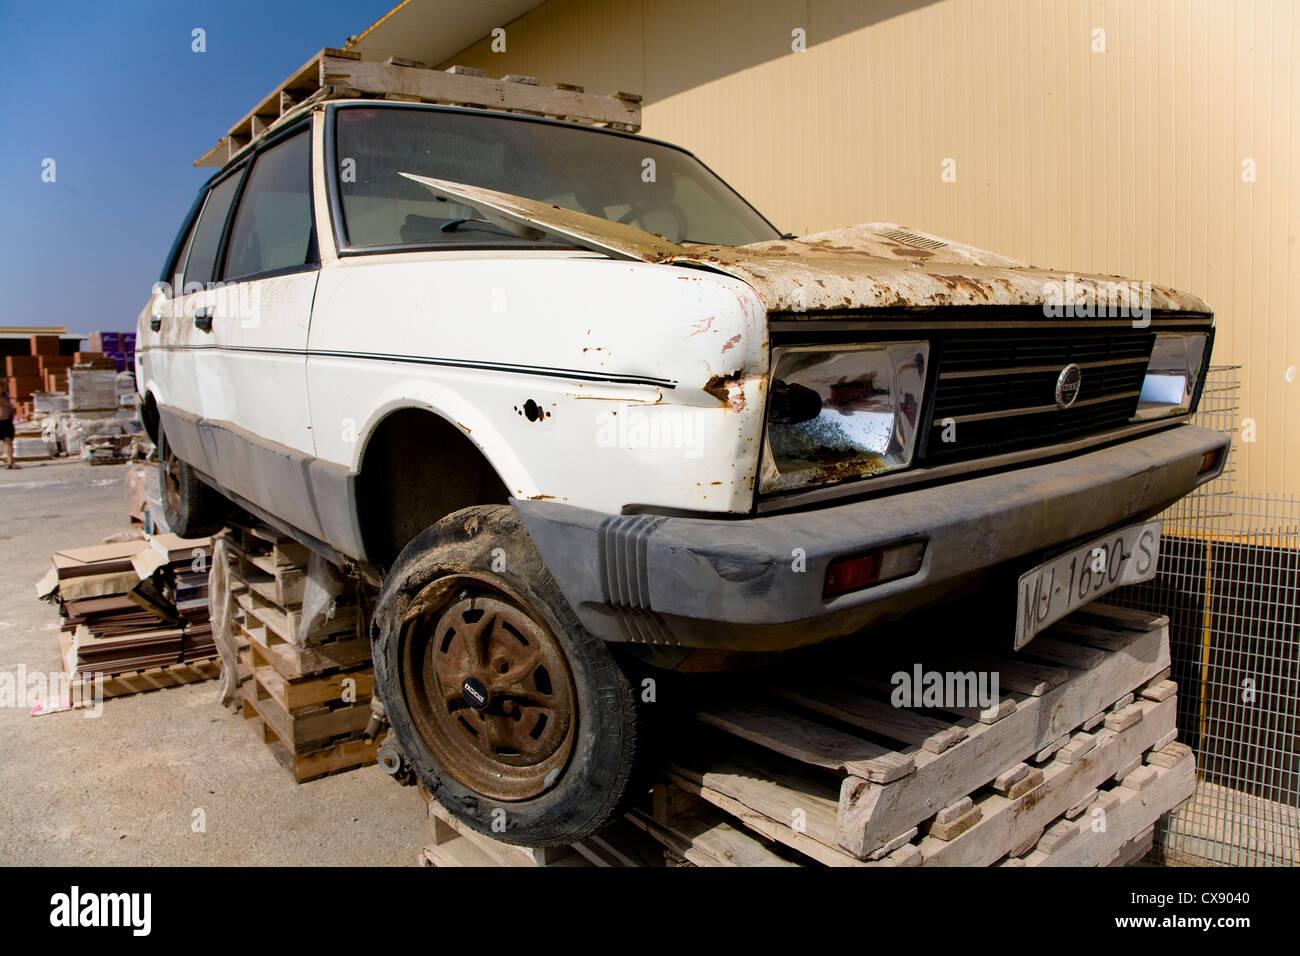 Broken down car resting on a set of pallets - Stock Image